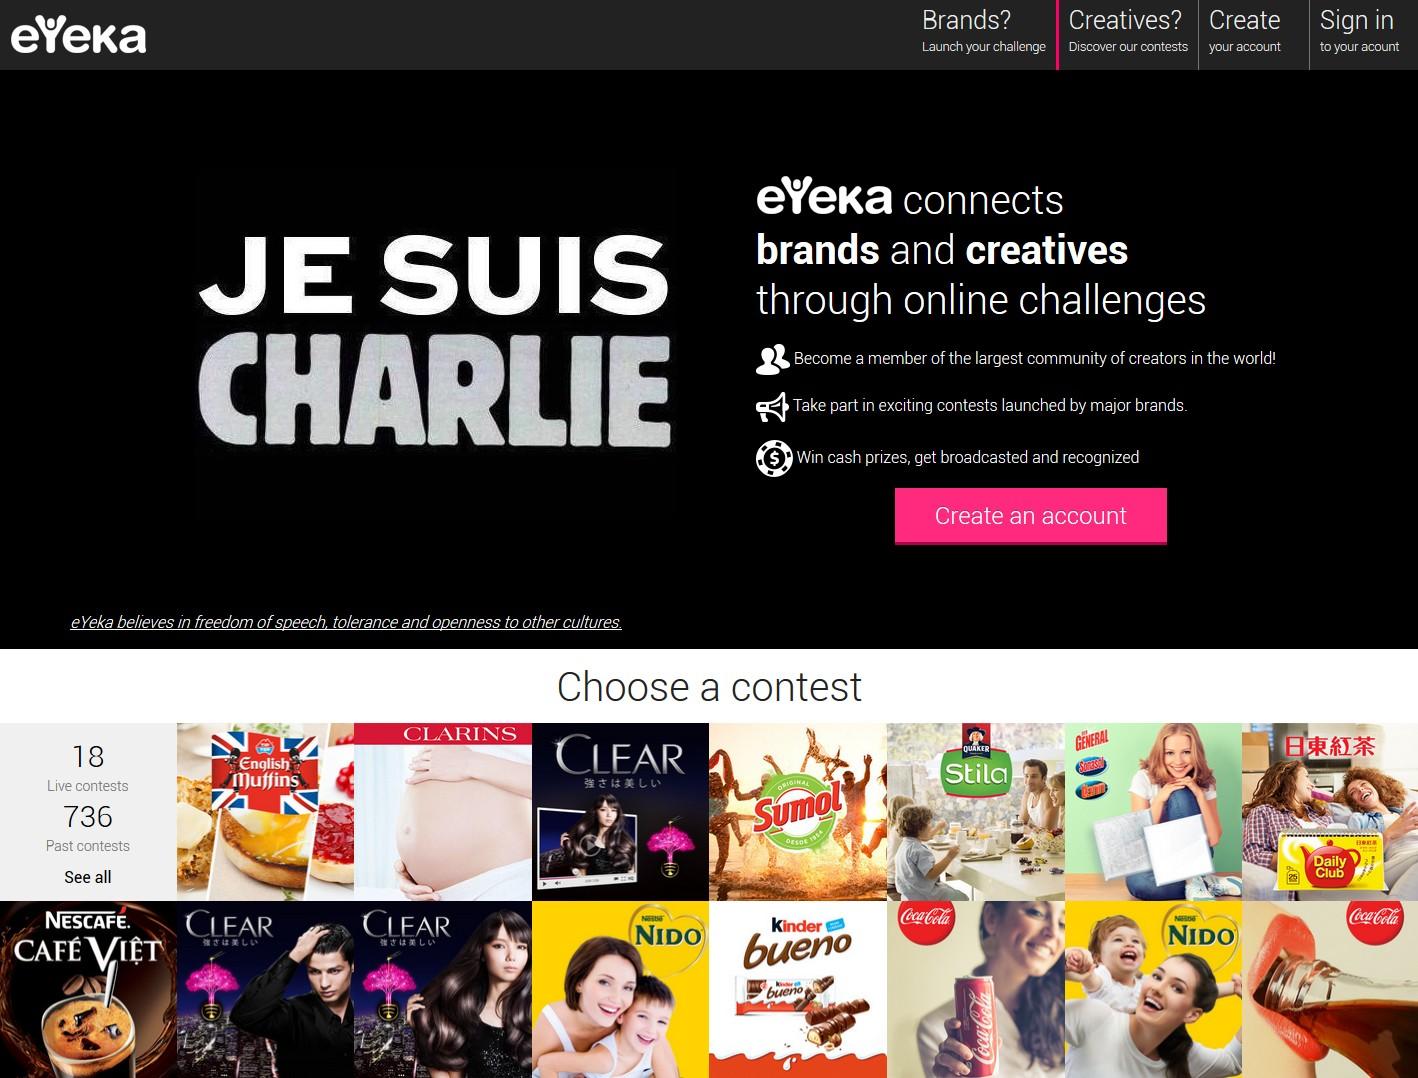 The #JeSuisCharlie-themed eYeka homepage in January